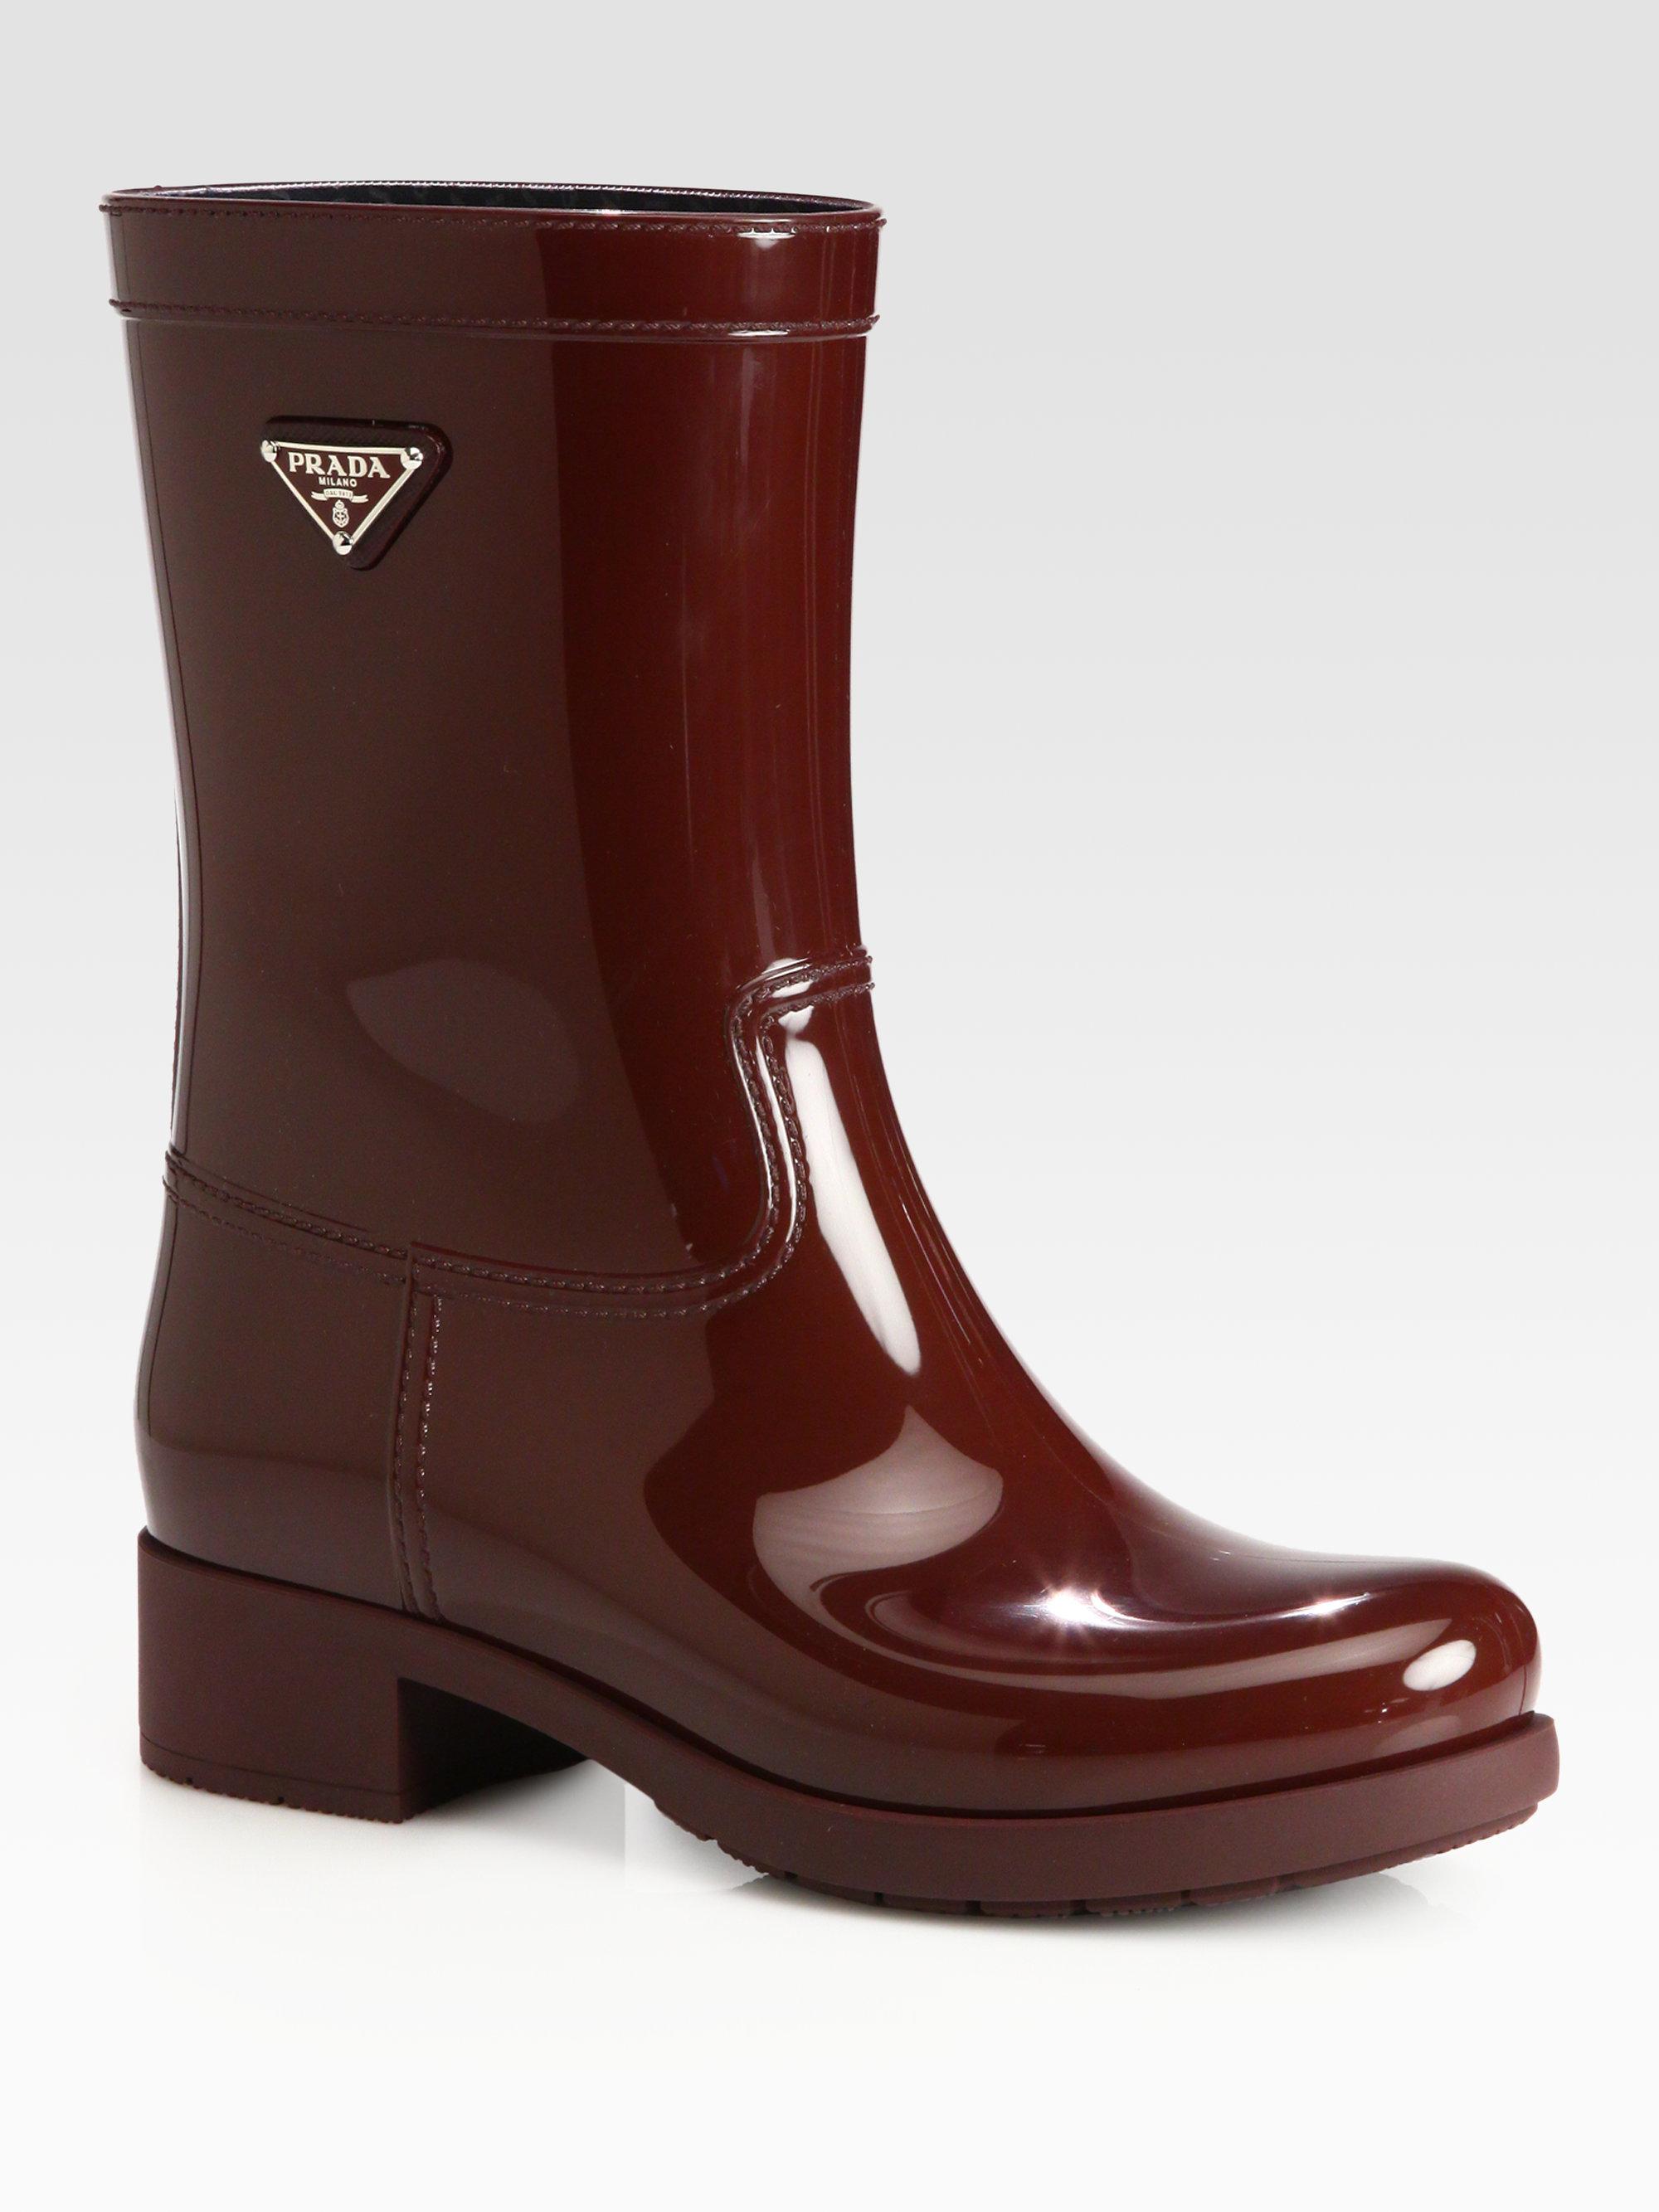 Prada Short Logo Rain Boots In Red Porpora Burgundy Lyst